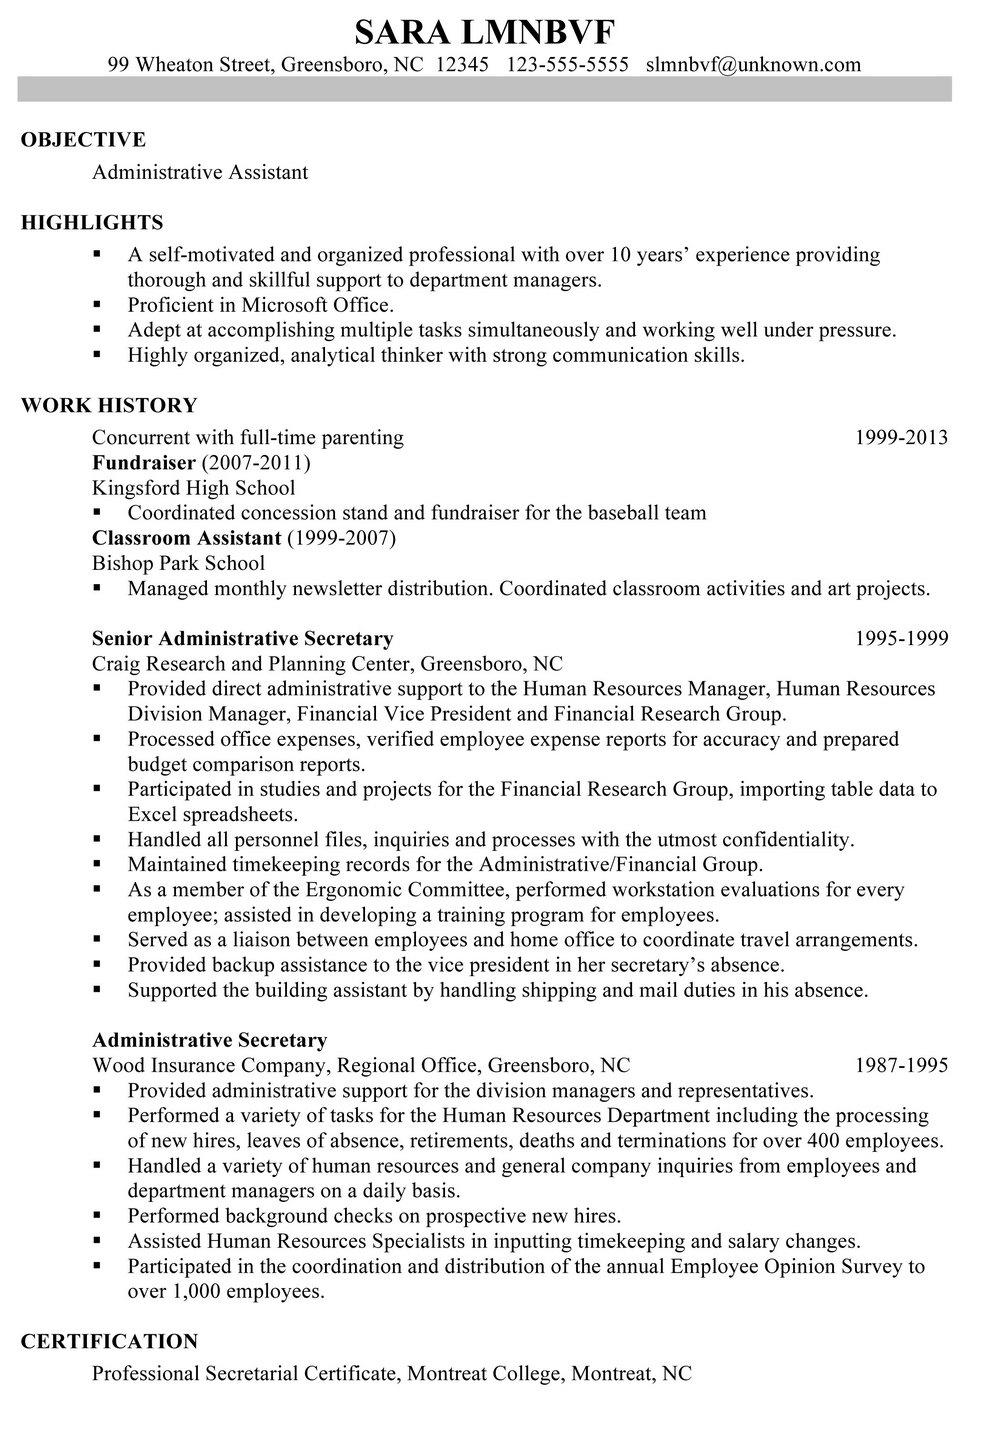 Resume Chronological Template